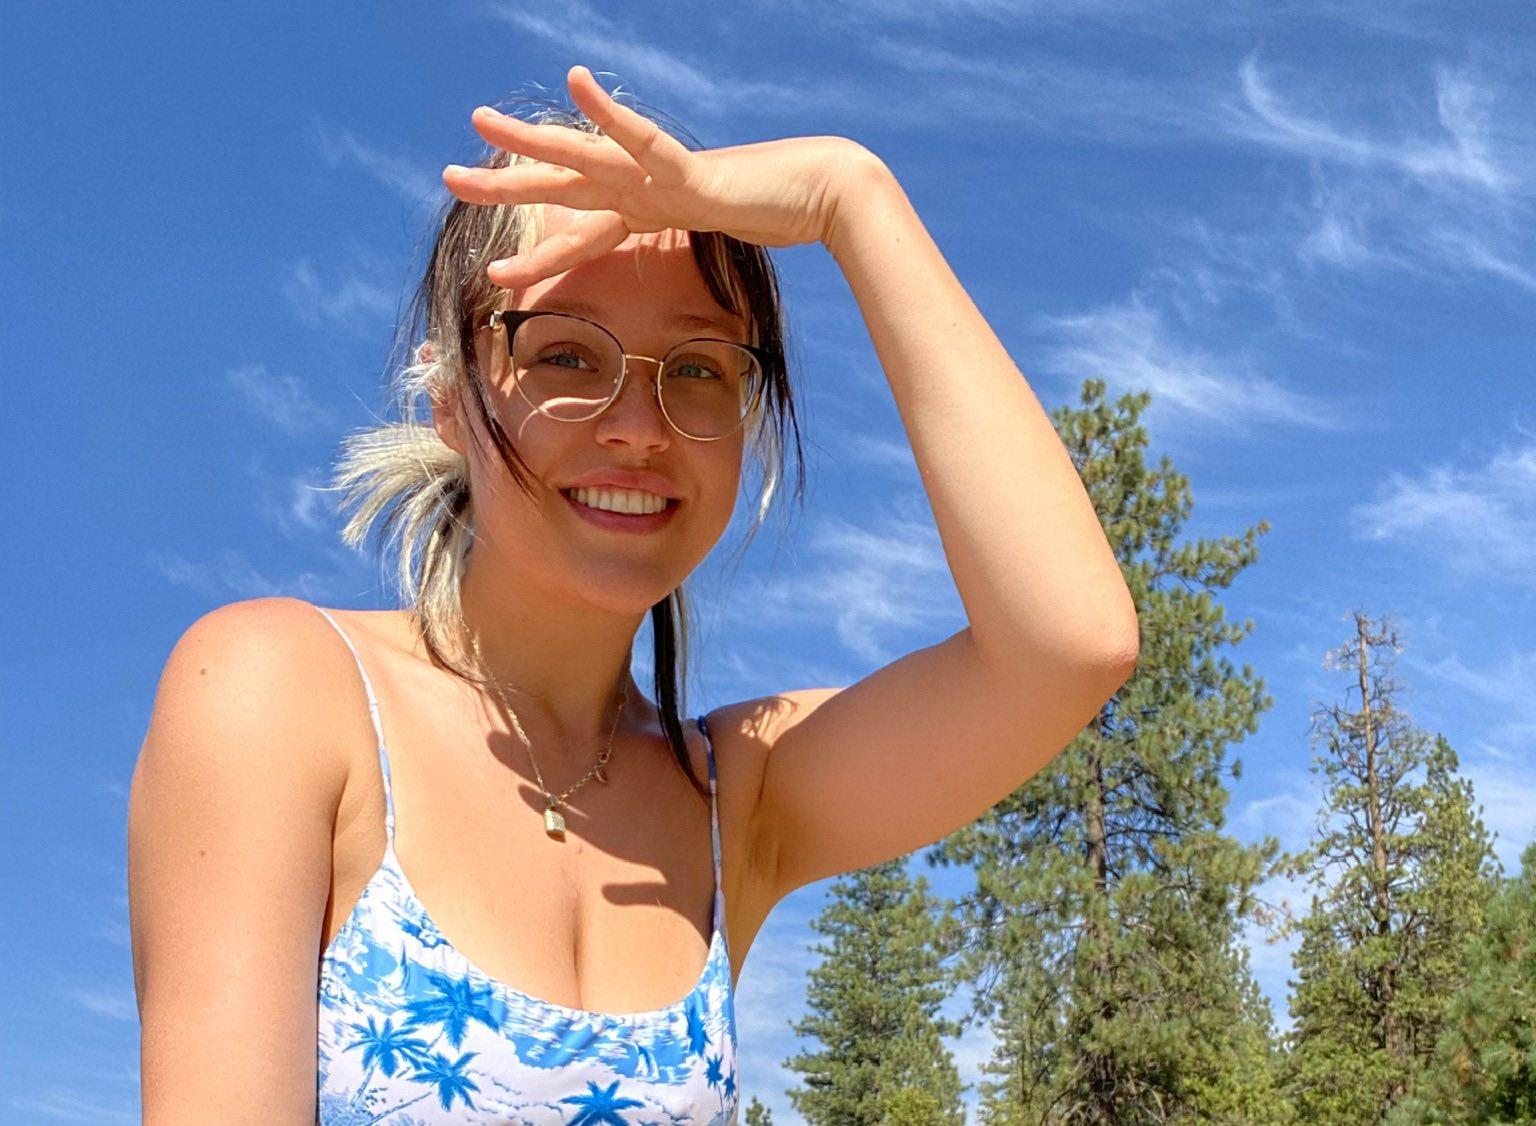 Sabrina Nichole, a Nude Model of Playboy